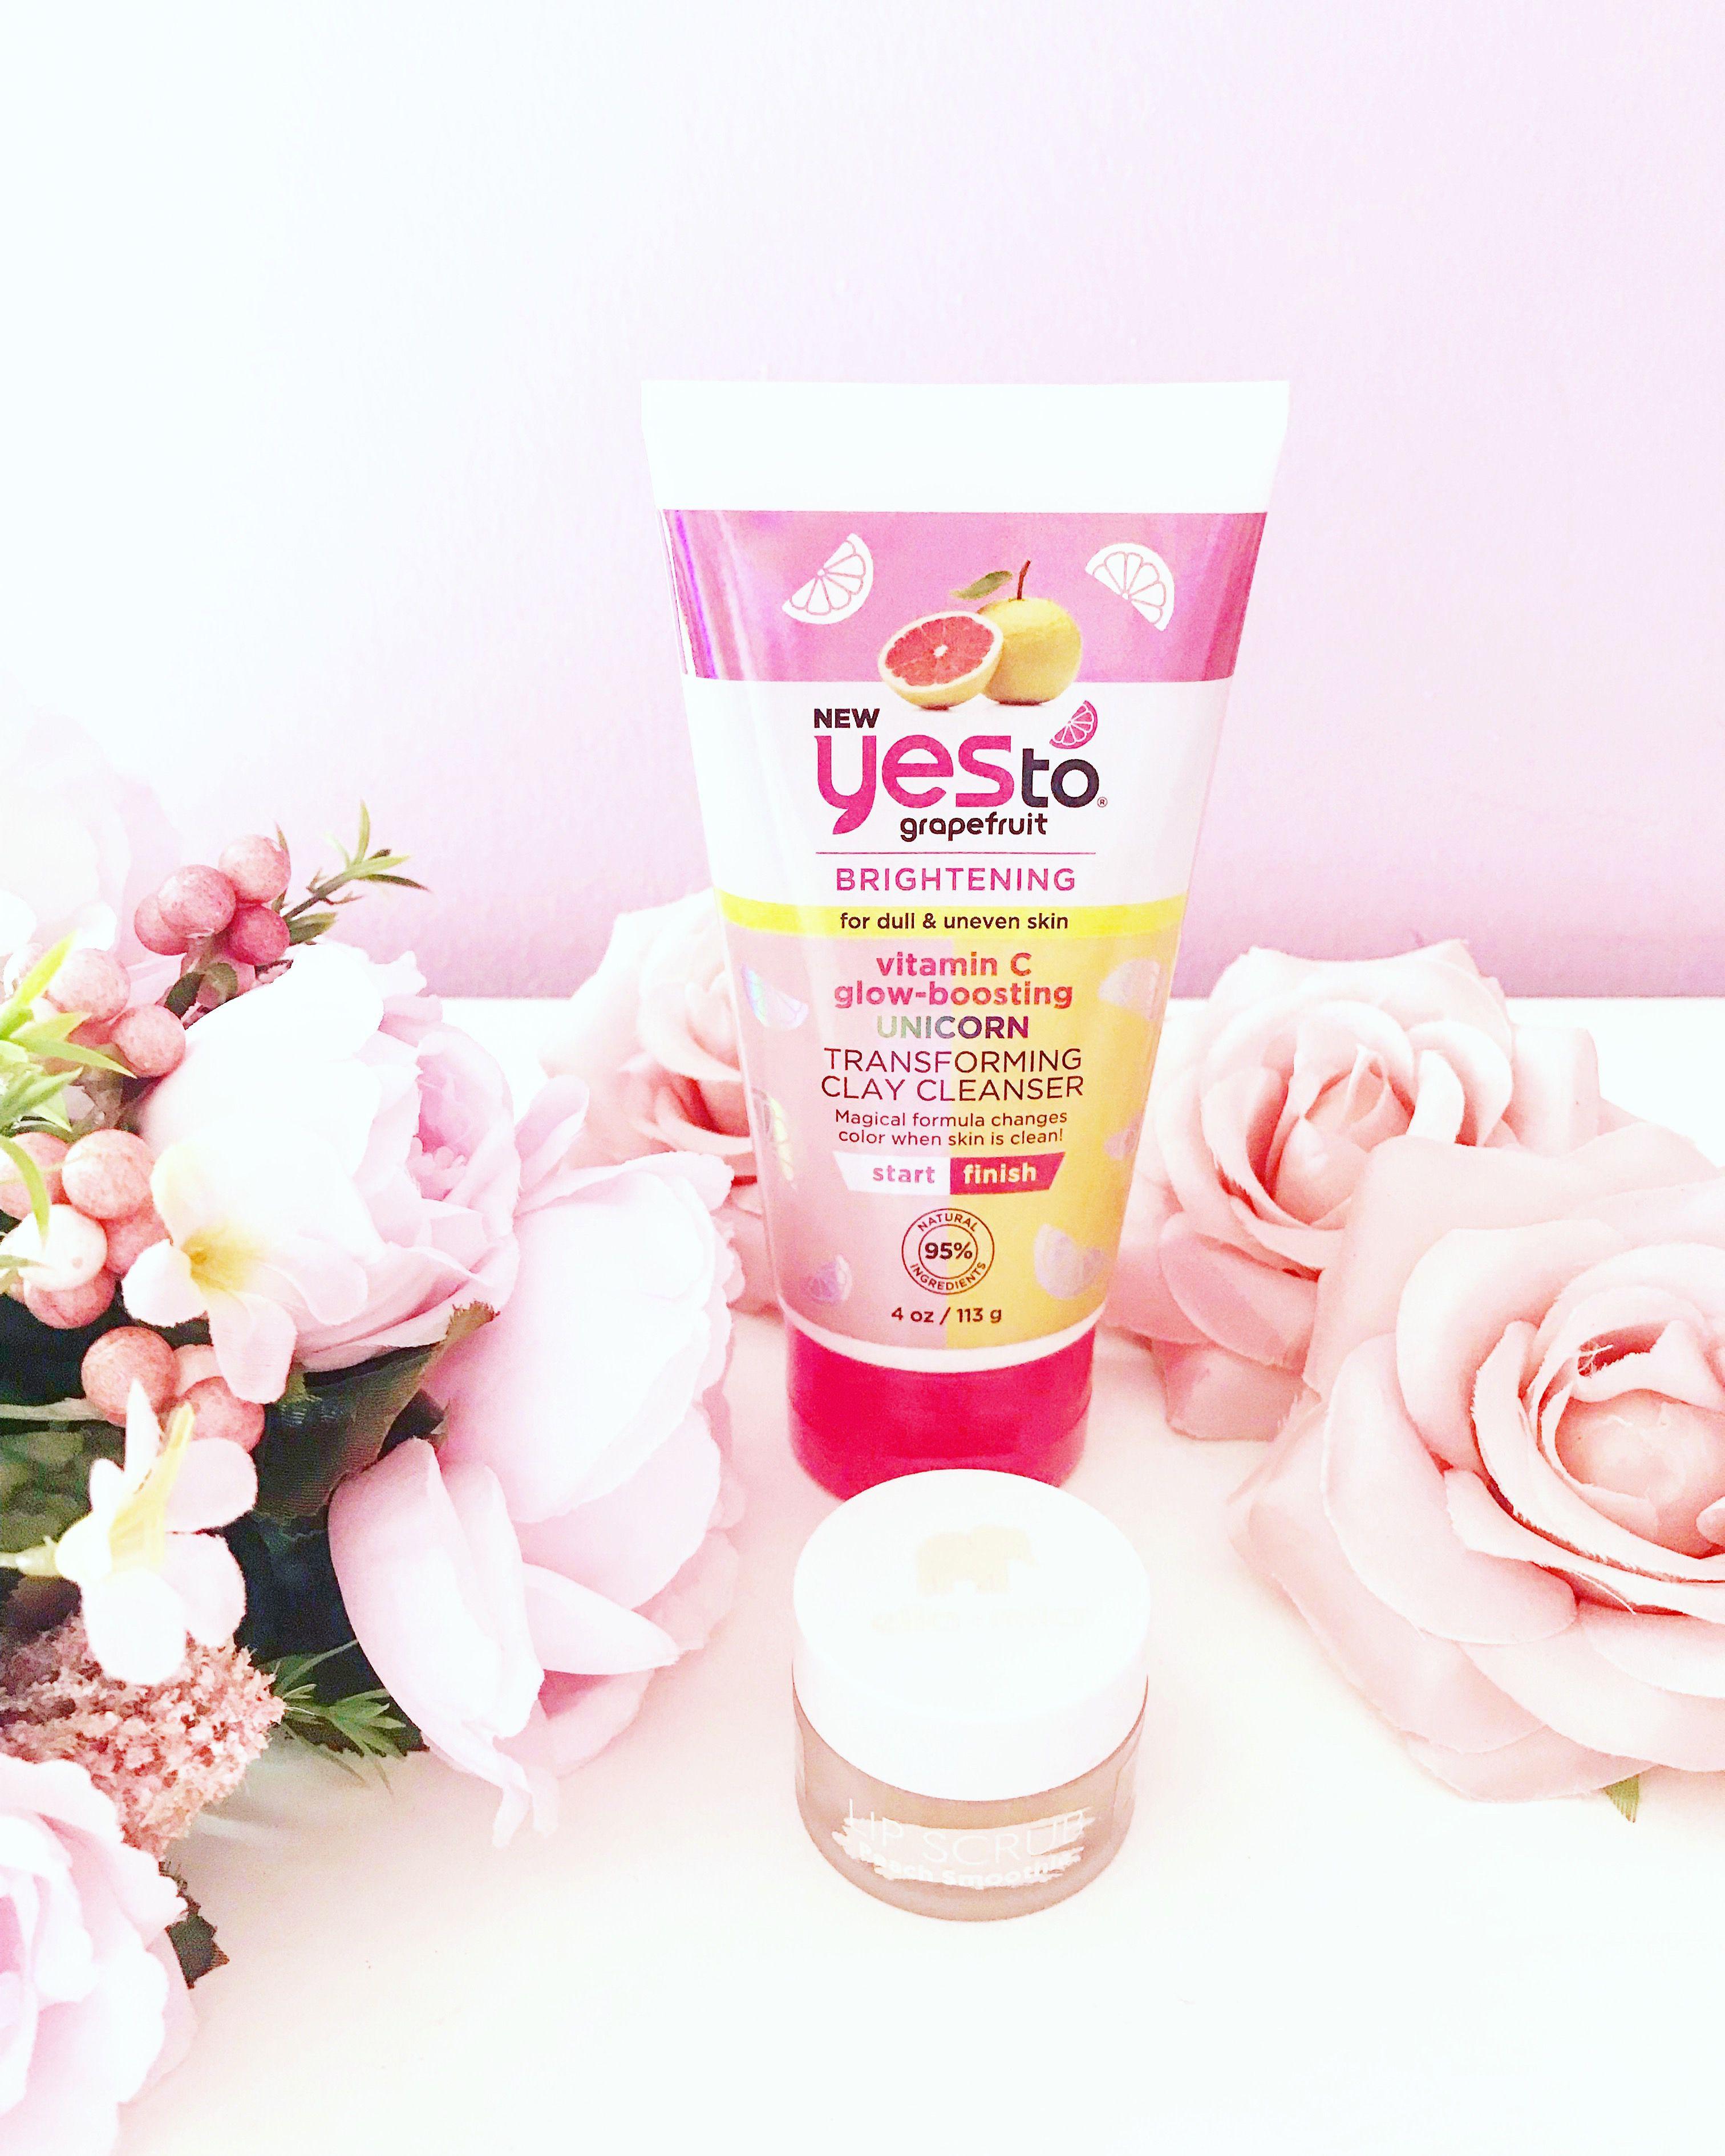 Unicorn Clay Cleanser Vitamins for skin, Cruelty free